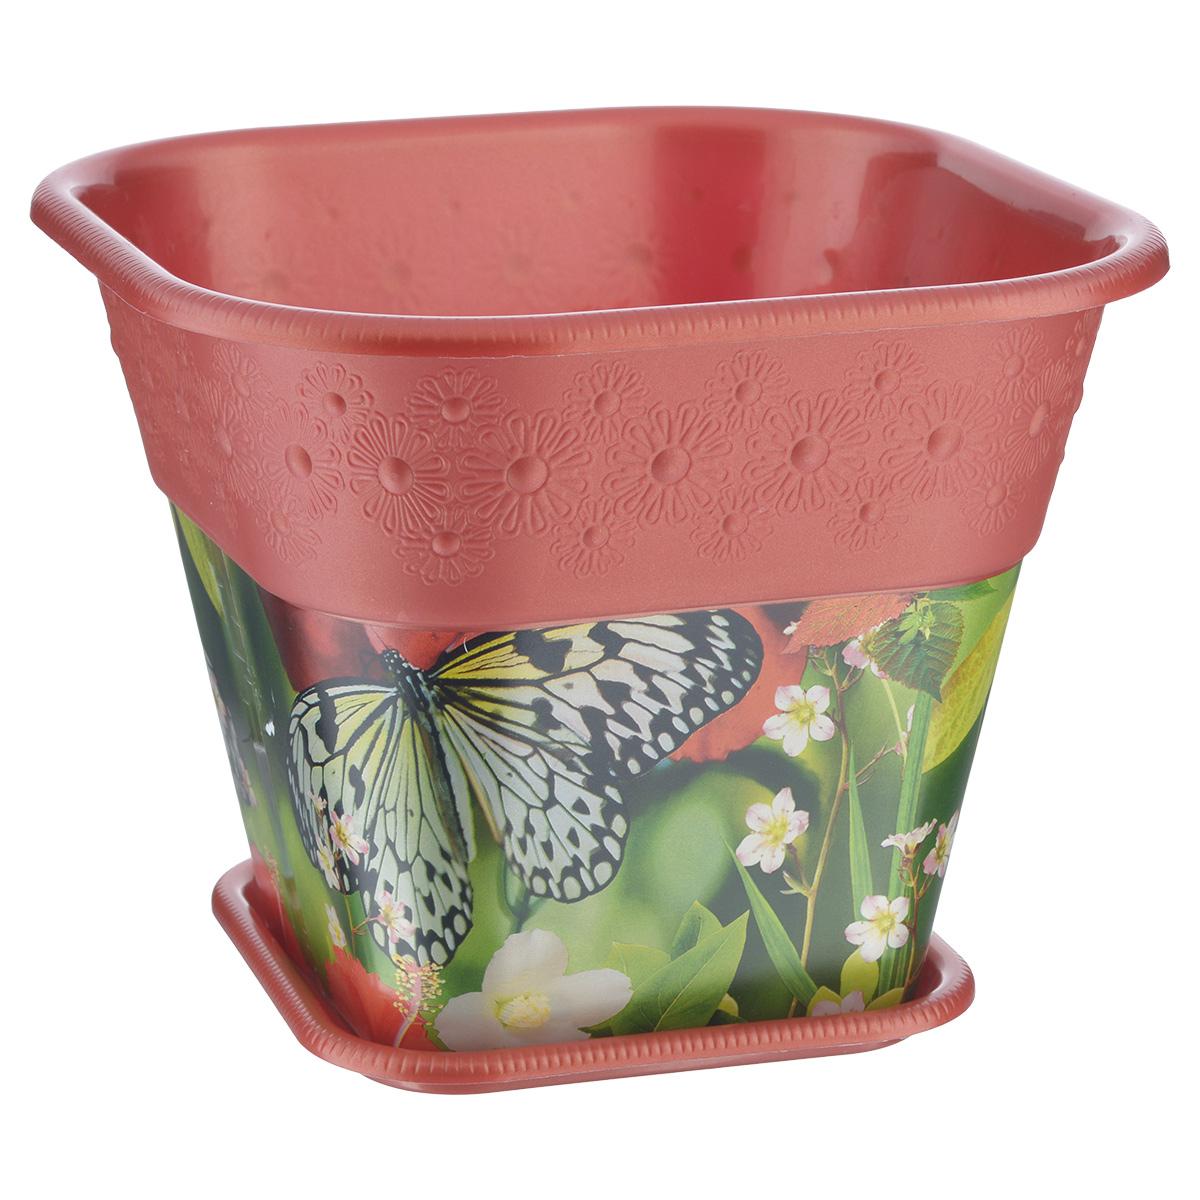 Кашпо Альтернатива Шарм, с поддоном, 4,5 л кашпо для цветов ive planter keter 17196813